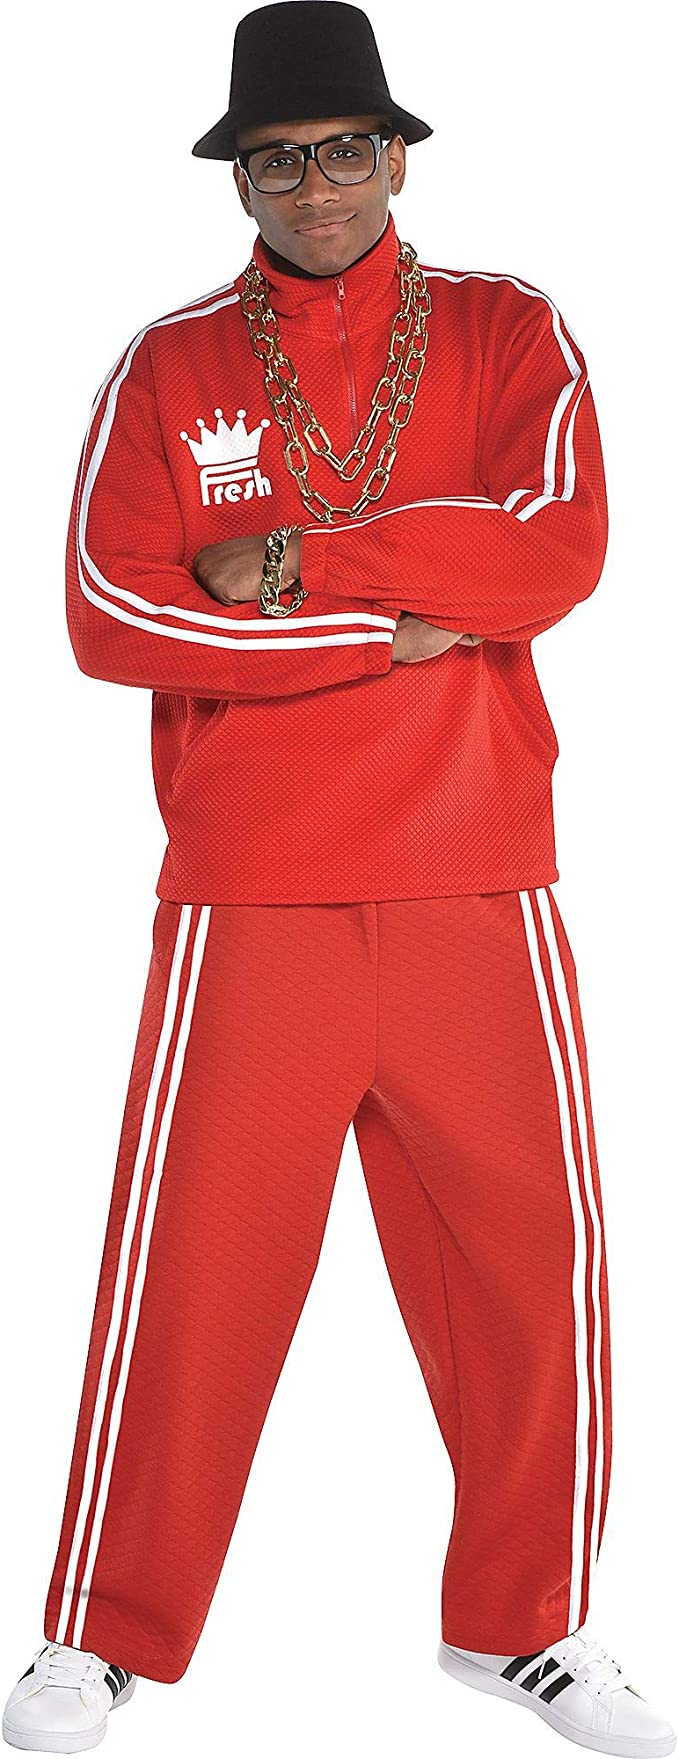 80s Men's Clothing   Shirts, Jeans, Jackets for Guys amscan Men Old School Rapper Costume Red One Size  AT vintagedancer.com